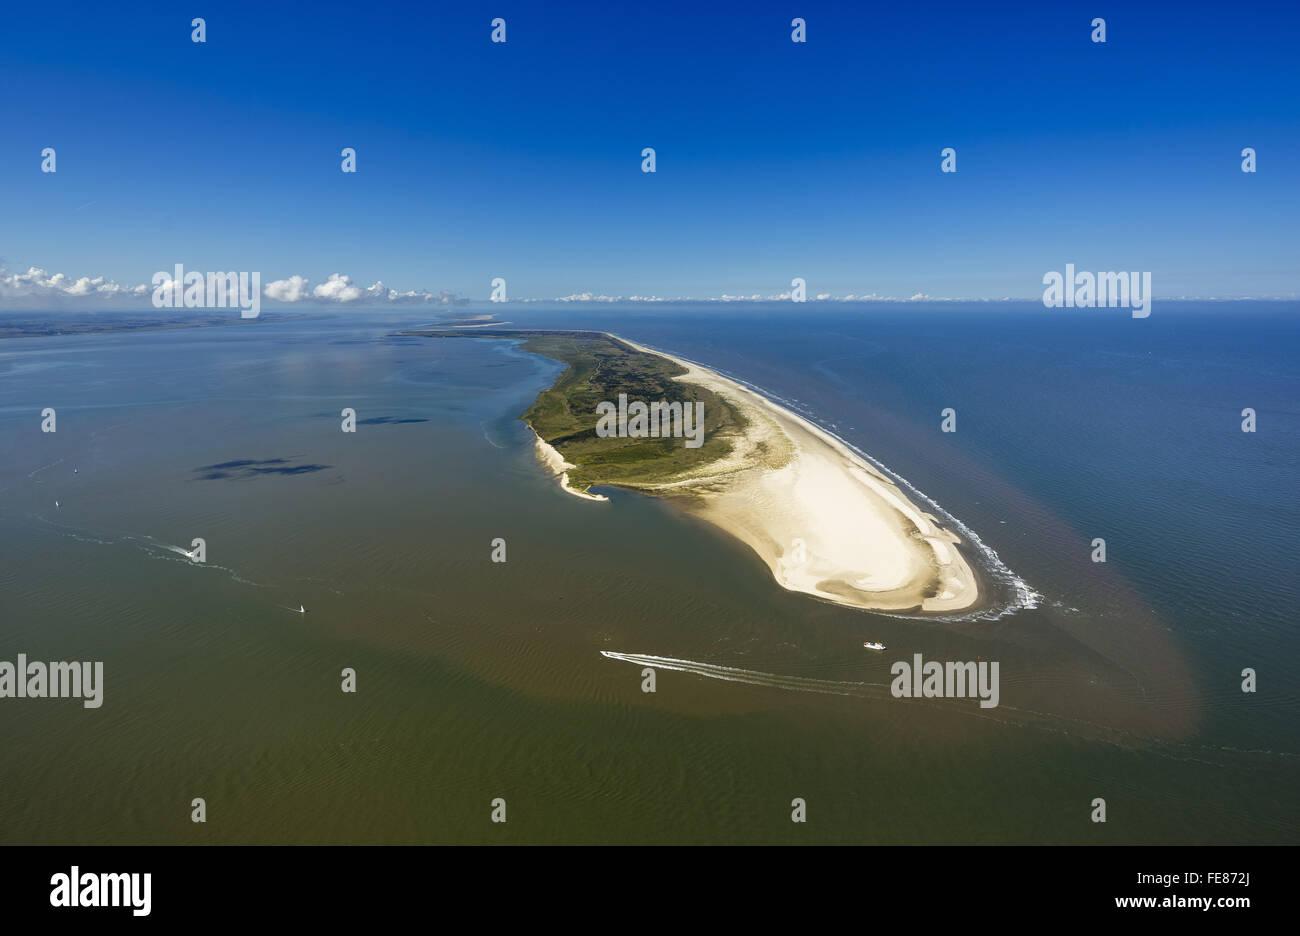 Osterhook, Wadden Sea, aerial view, Langeoog, North Sea, North Sea island, East Frisian Islands, Lower Saxony, Germany, Stock Photo